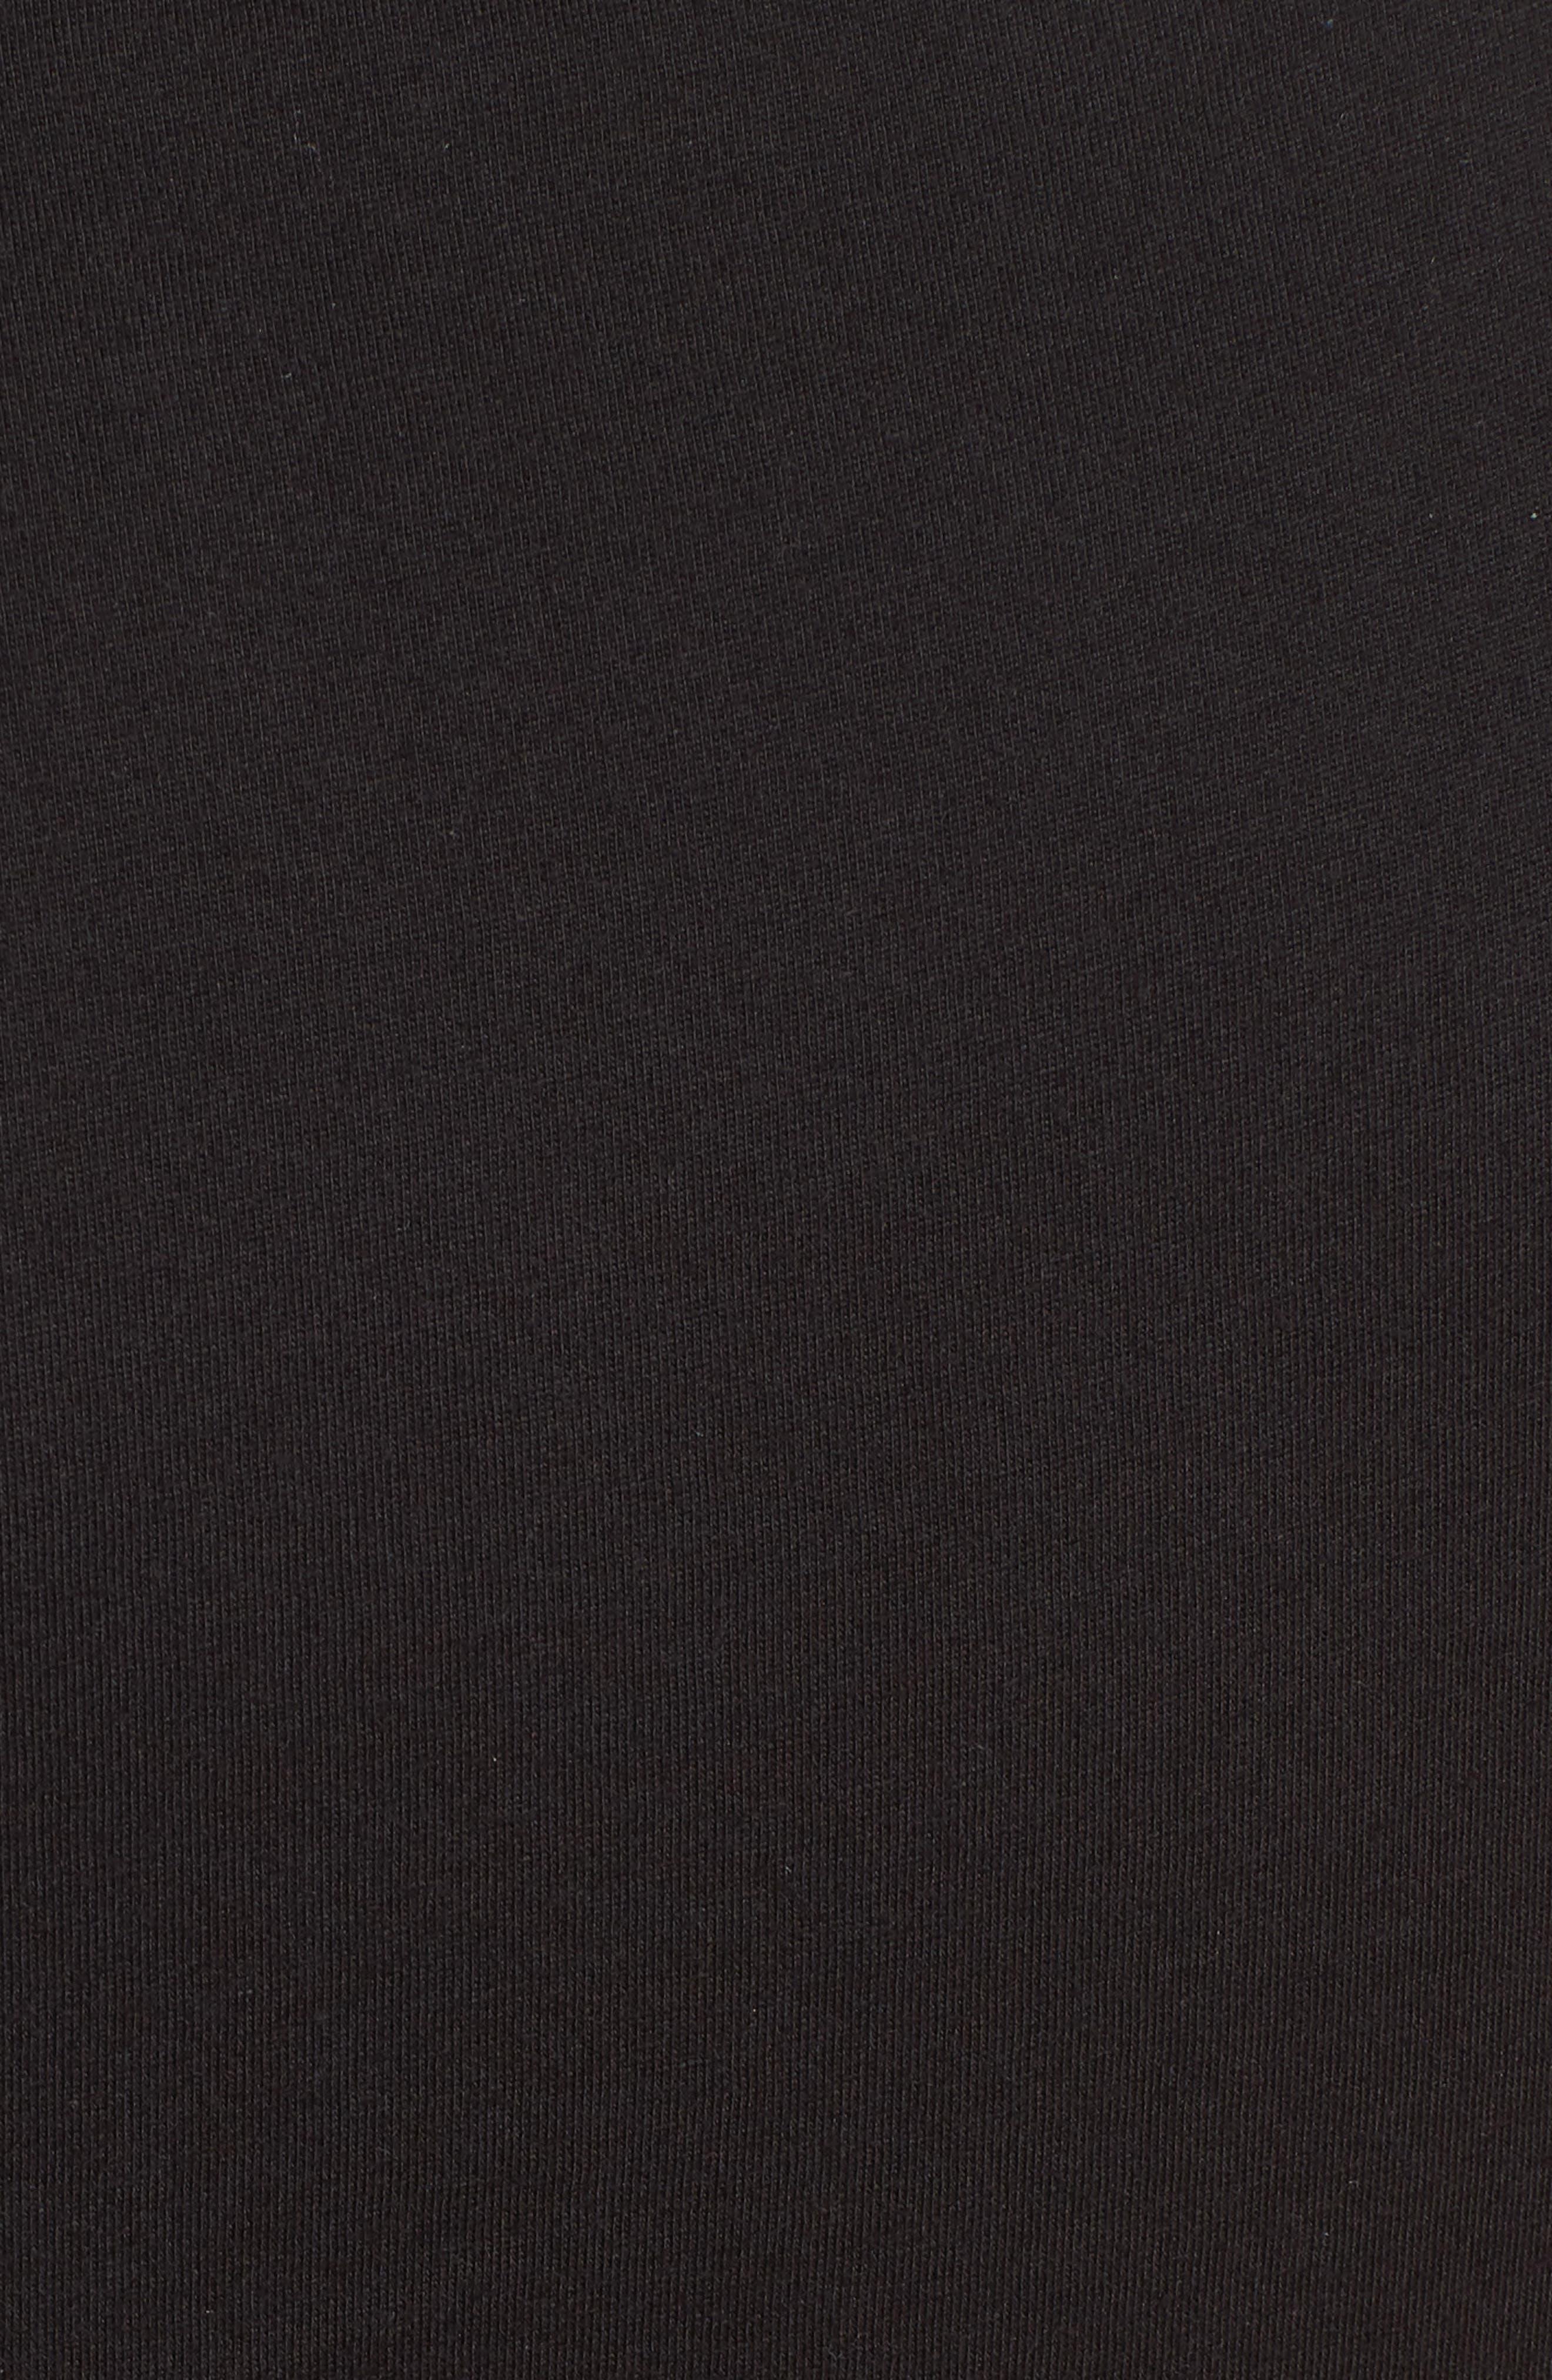 Knot Front Cutout T-Shirt Dress,                             Alternate thumbnail 5, color,                             BLACK